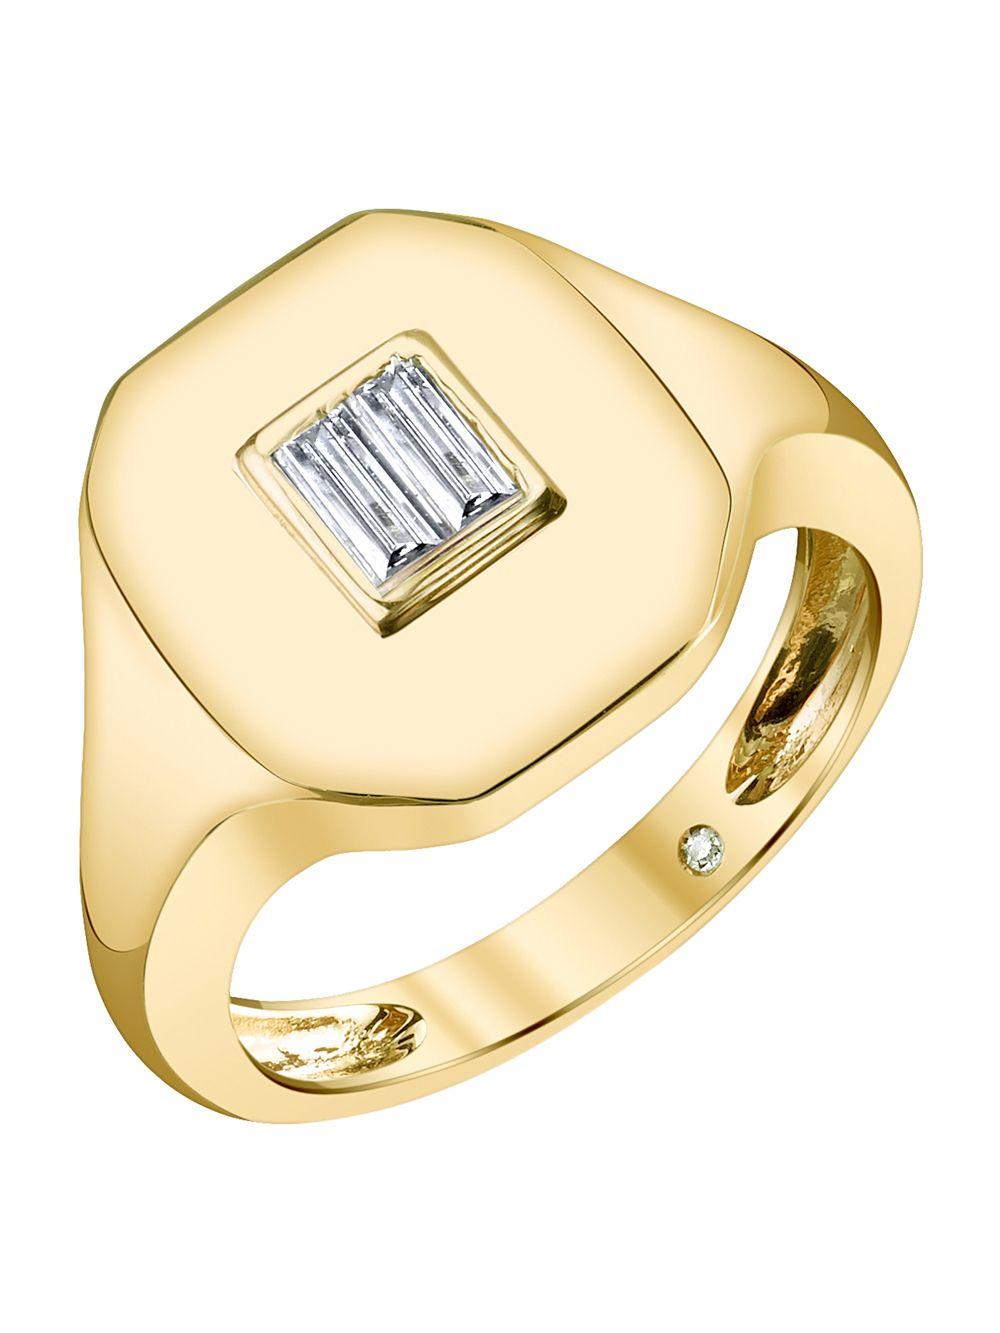 Shay 18K GOLD BAGUETTE PINKY DIAMOND RING